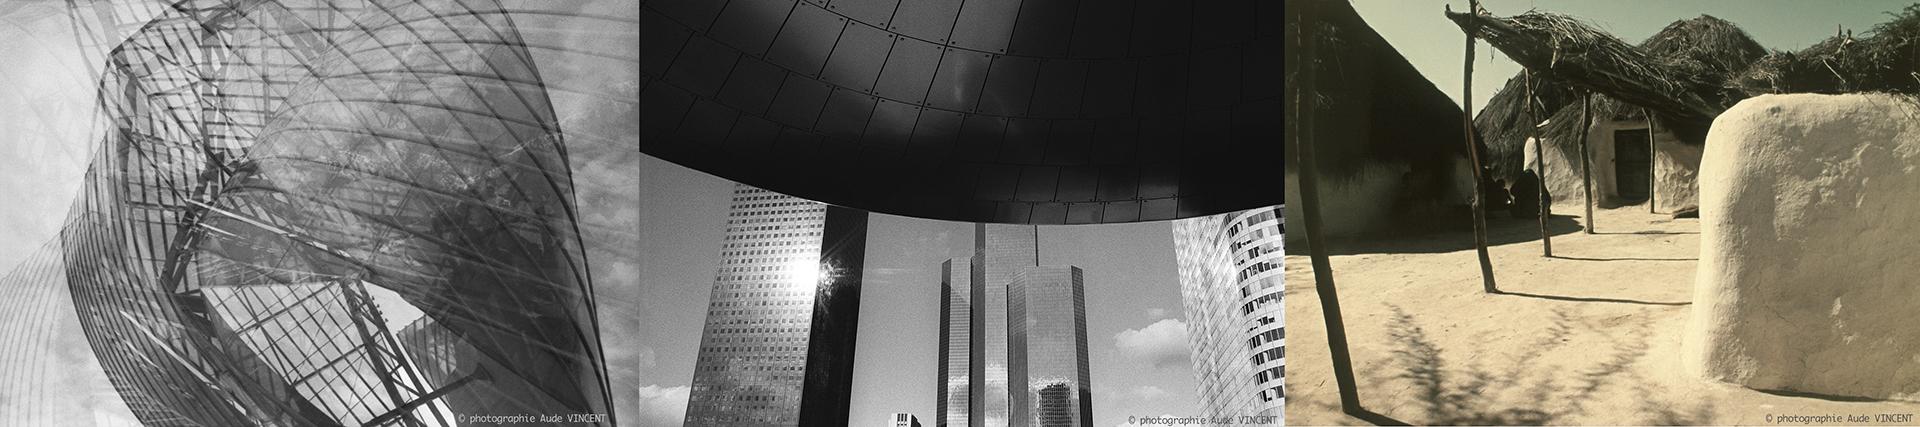 Photographies d'architectures